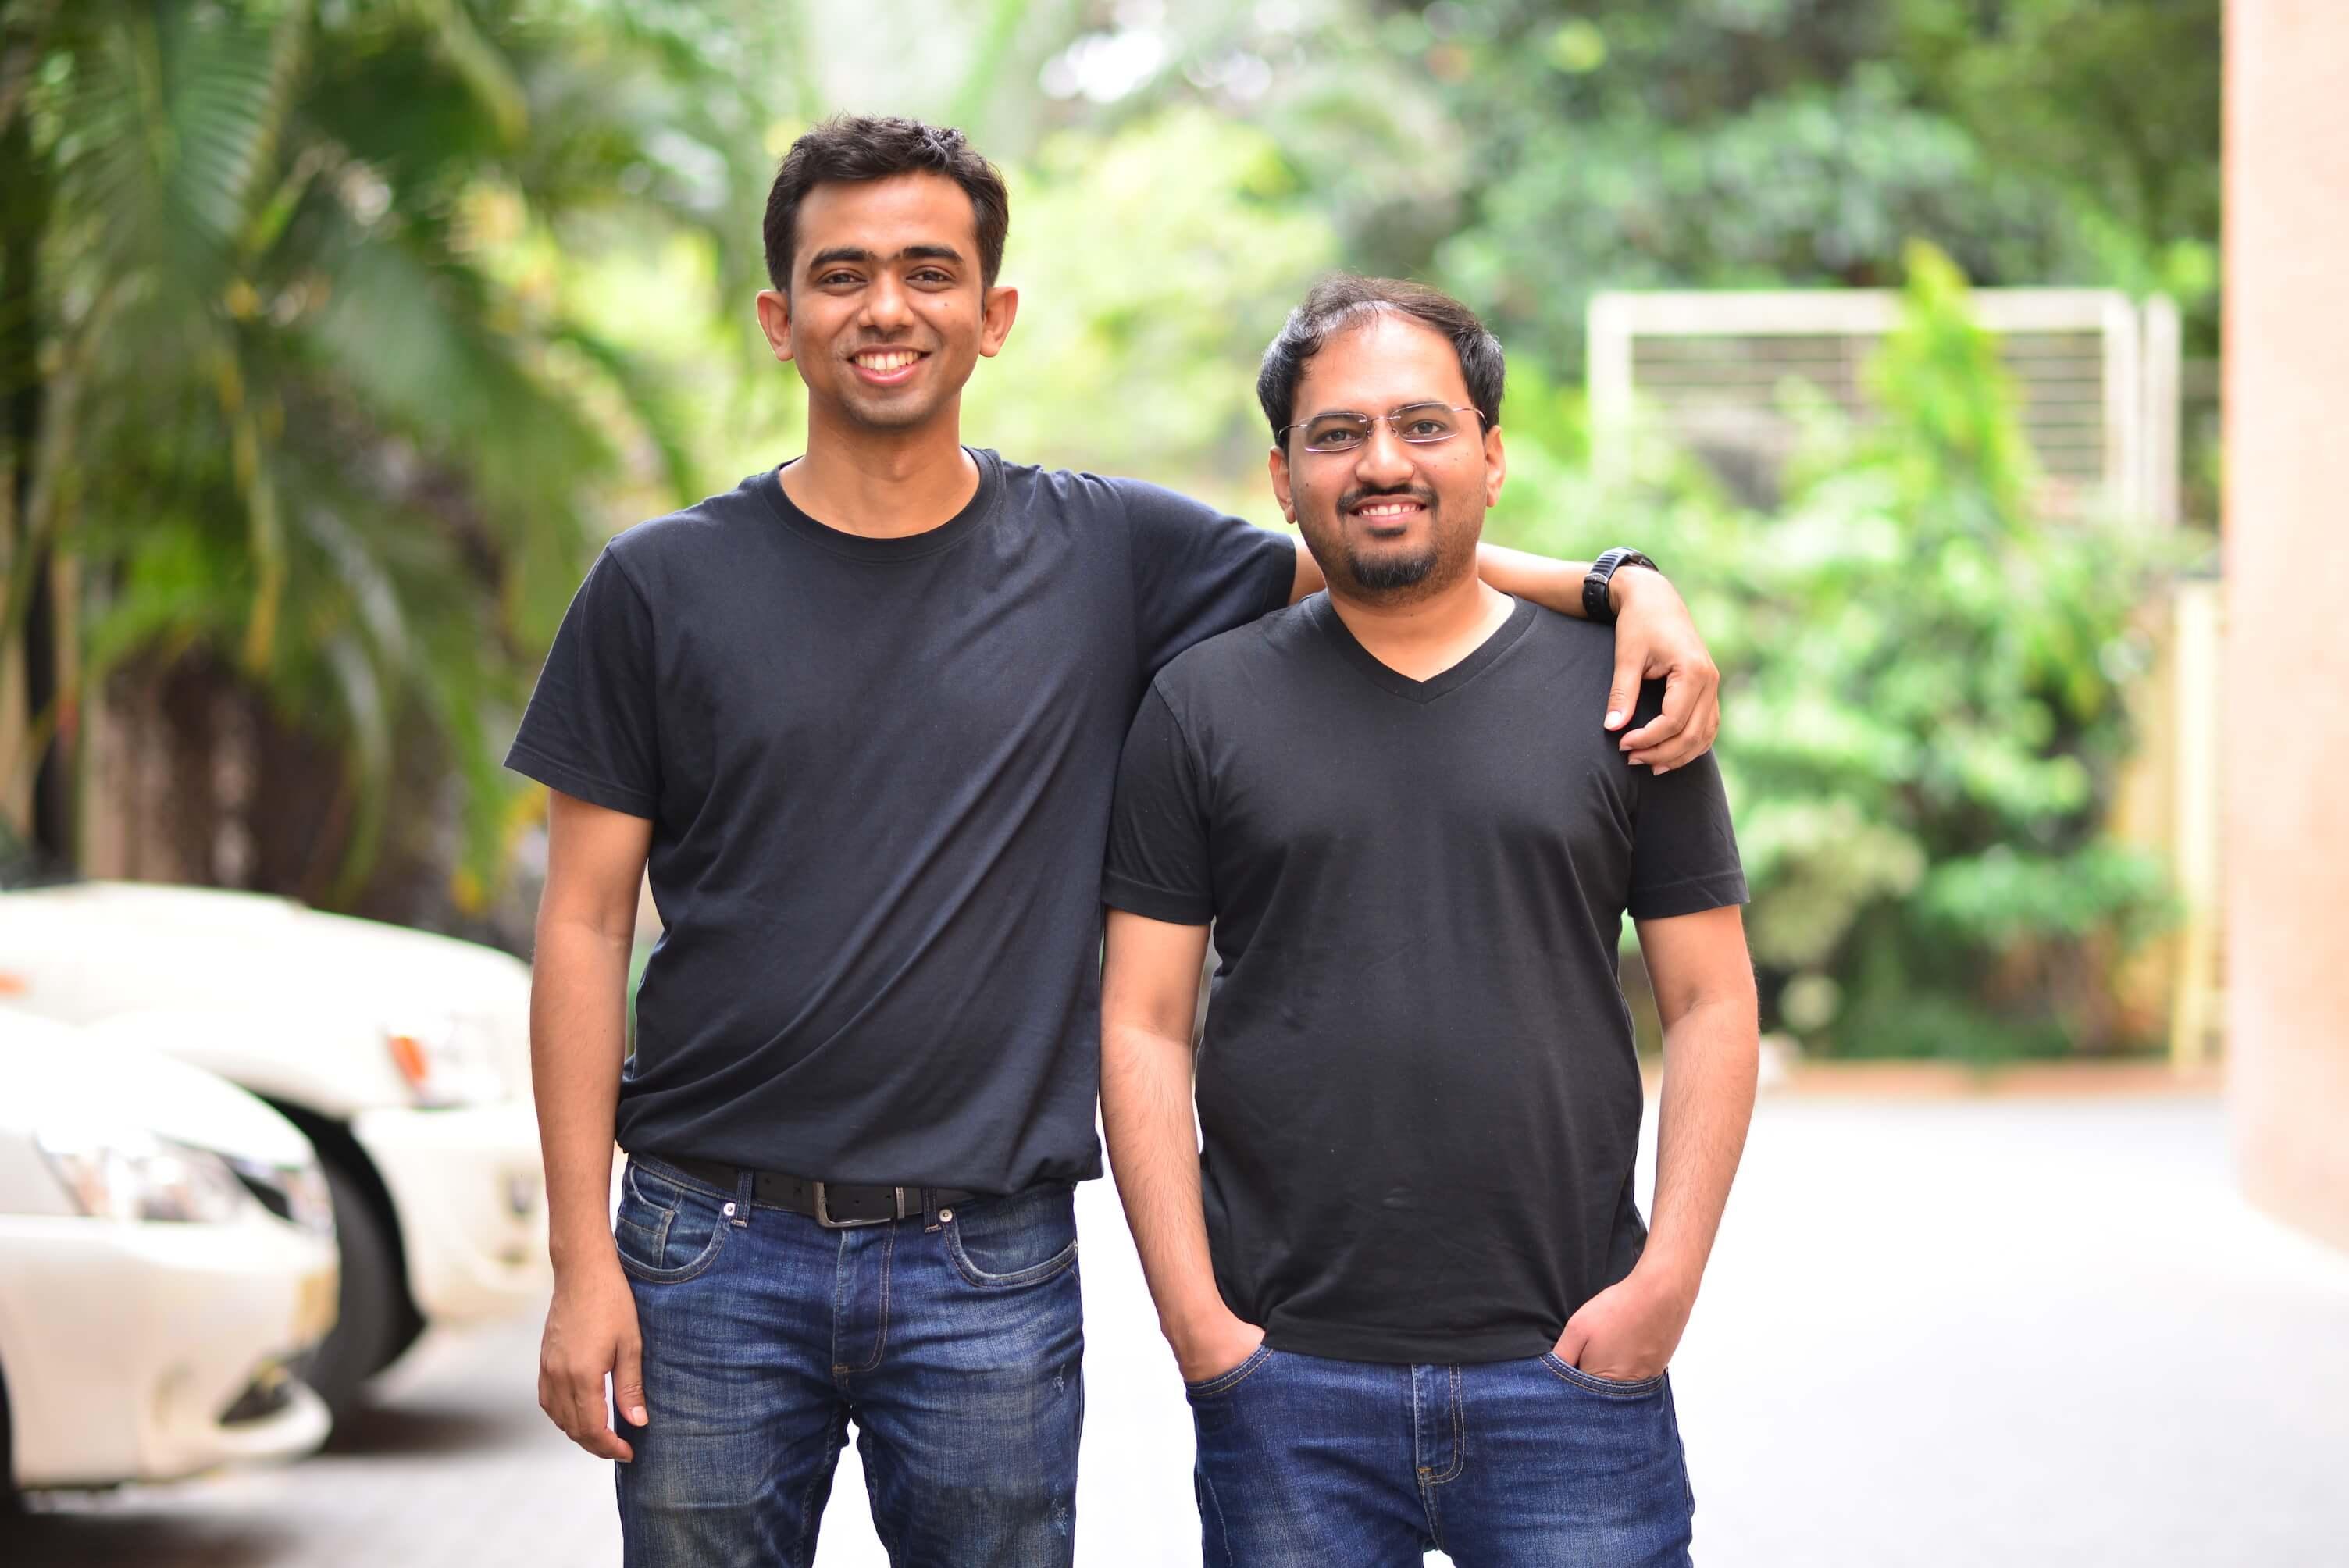 Two co-founders of Recko: Saurya Prakash Sinha and Prashant Borde